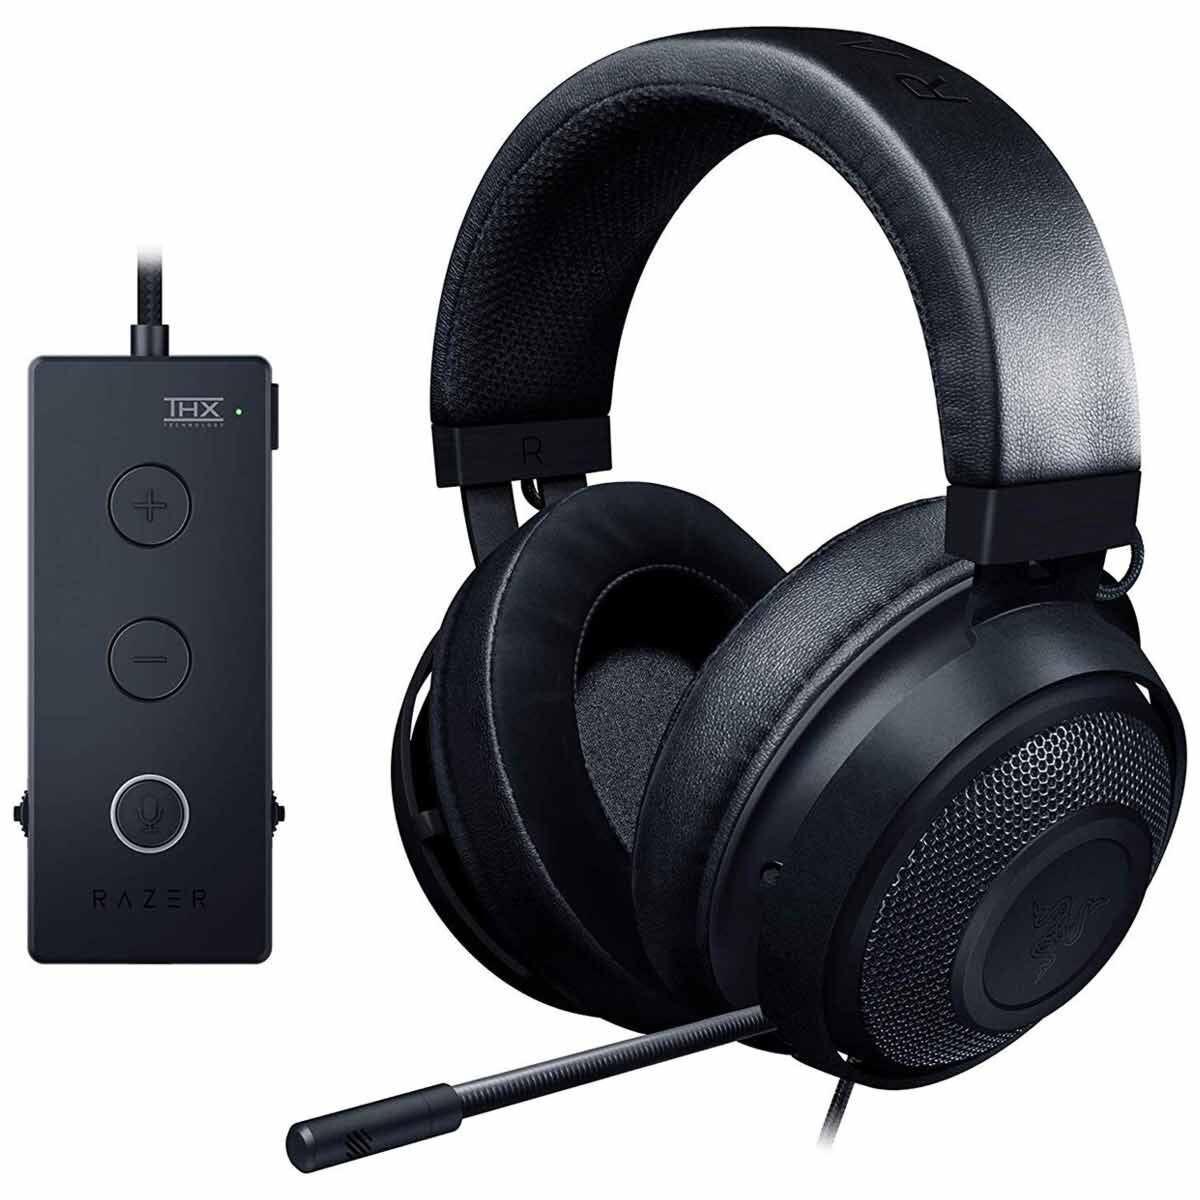 Razer Kraken Tournament Edition Wired Gaming Headset Multi-Platform Black